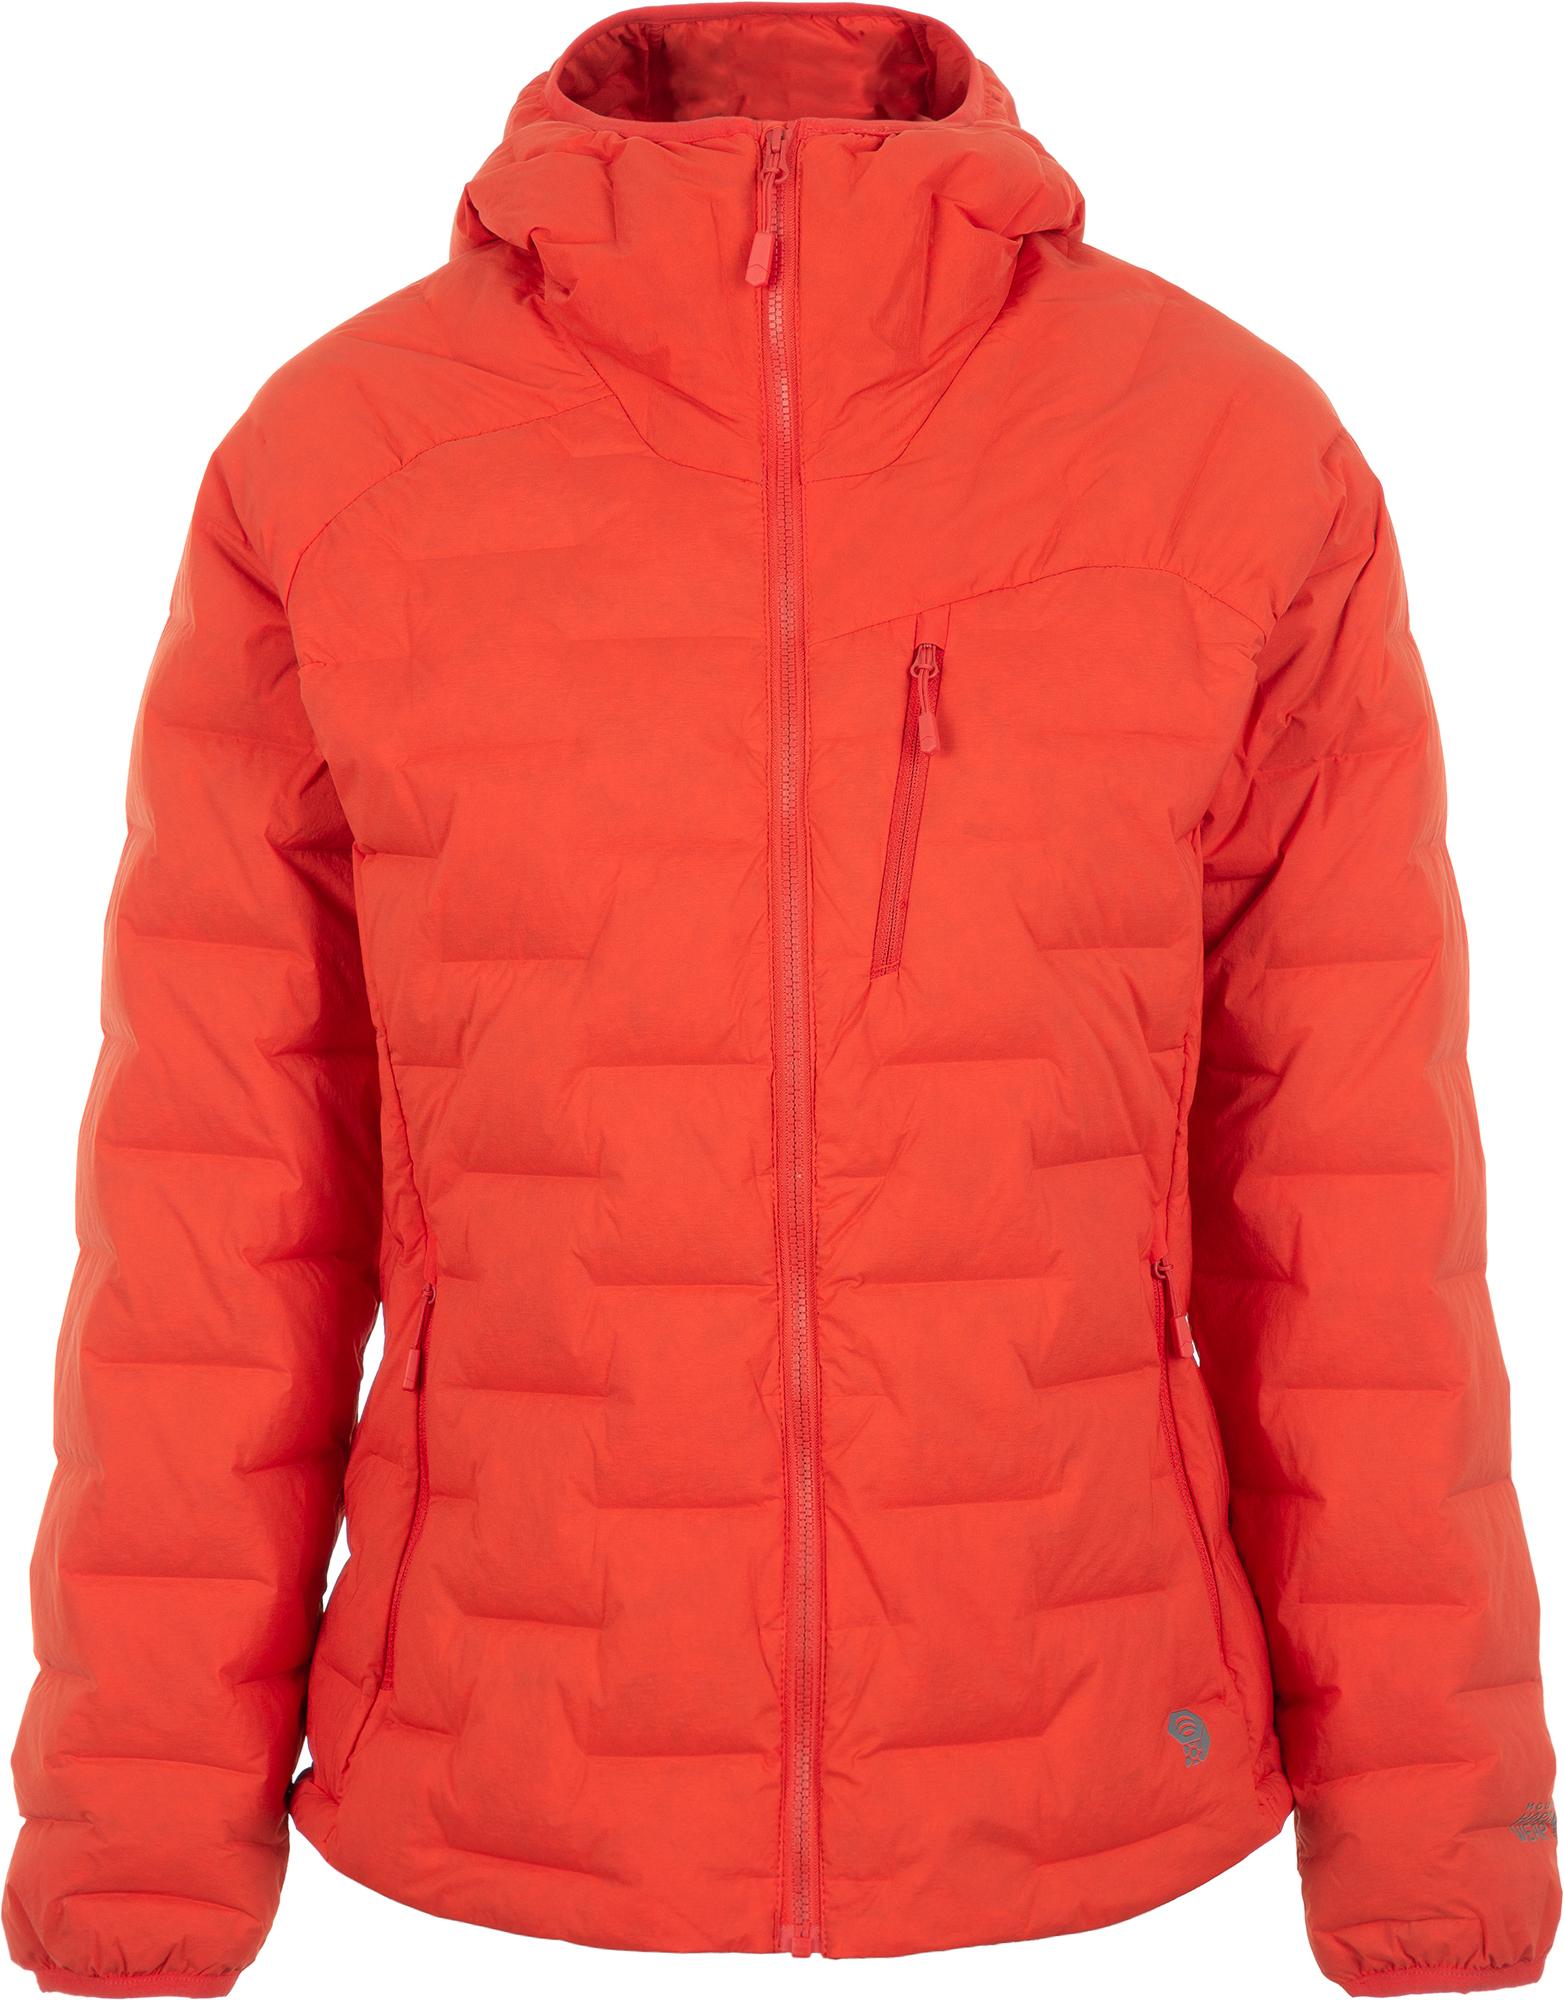 цена Mountain Hardwear Куртка пуховая женская Mountain Hardwear, размер 50 онлайн в 2017 году